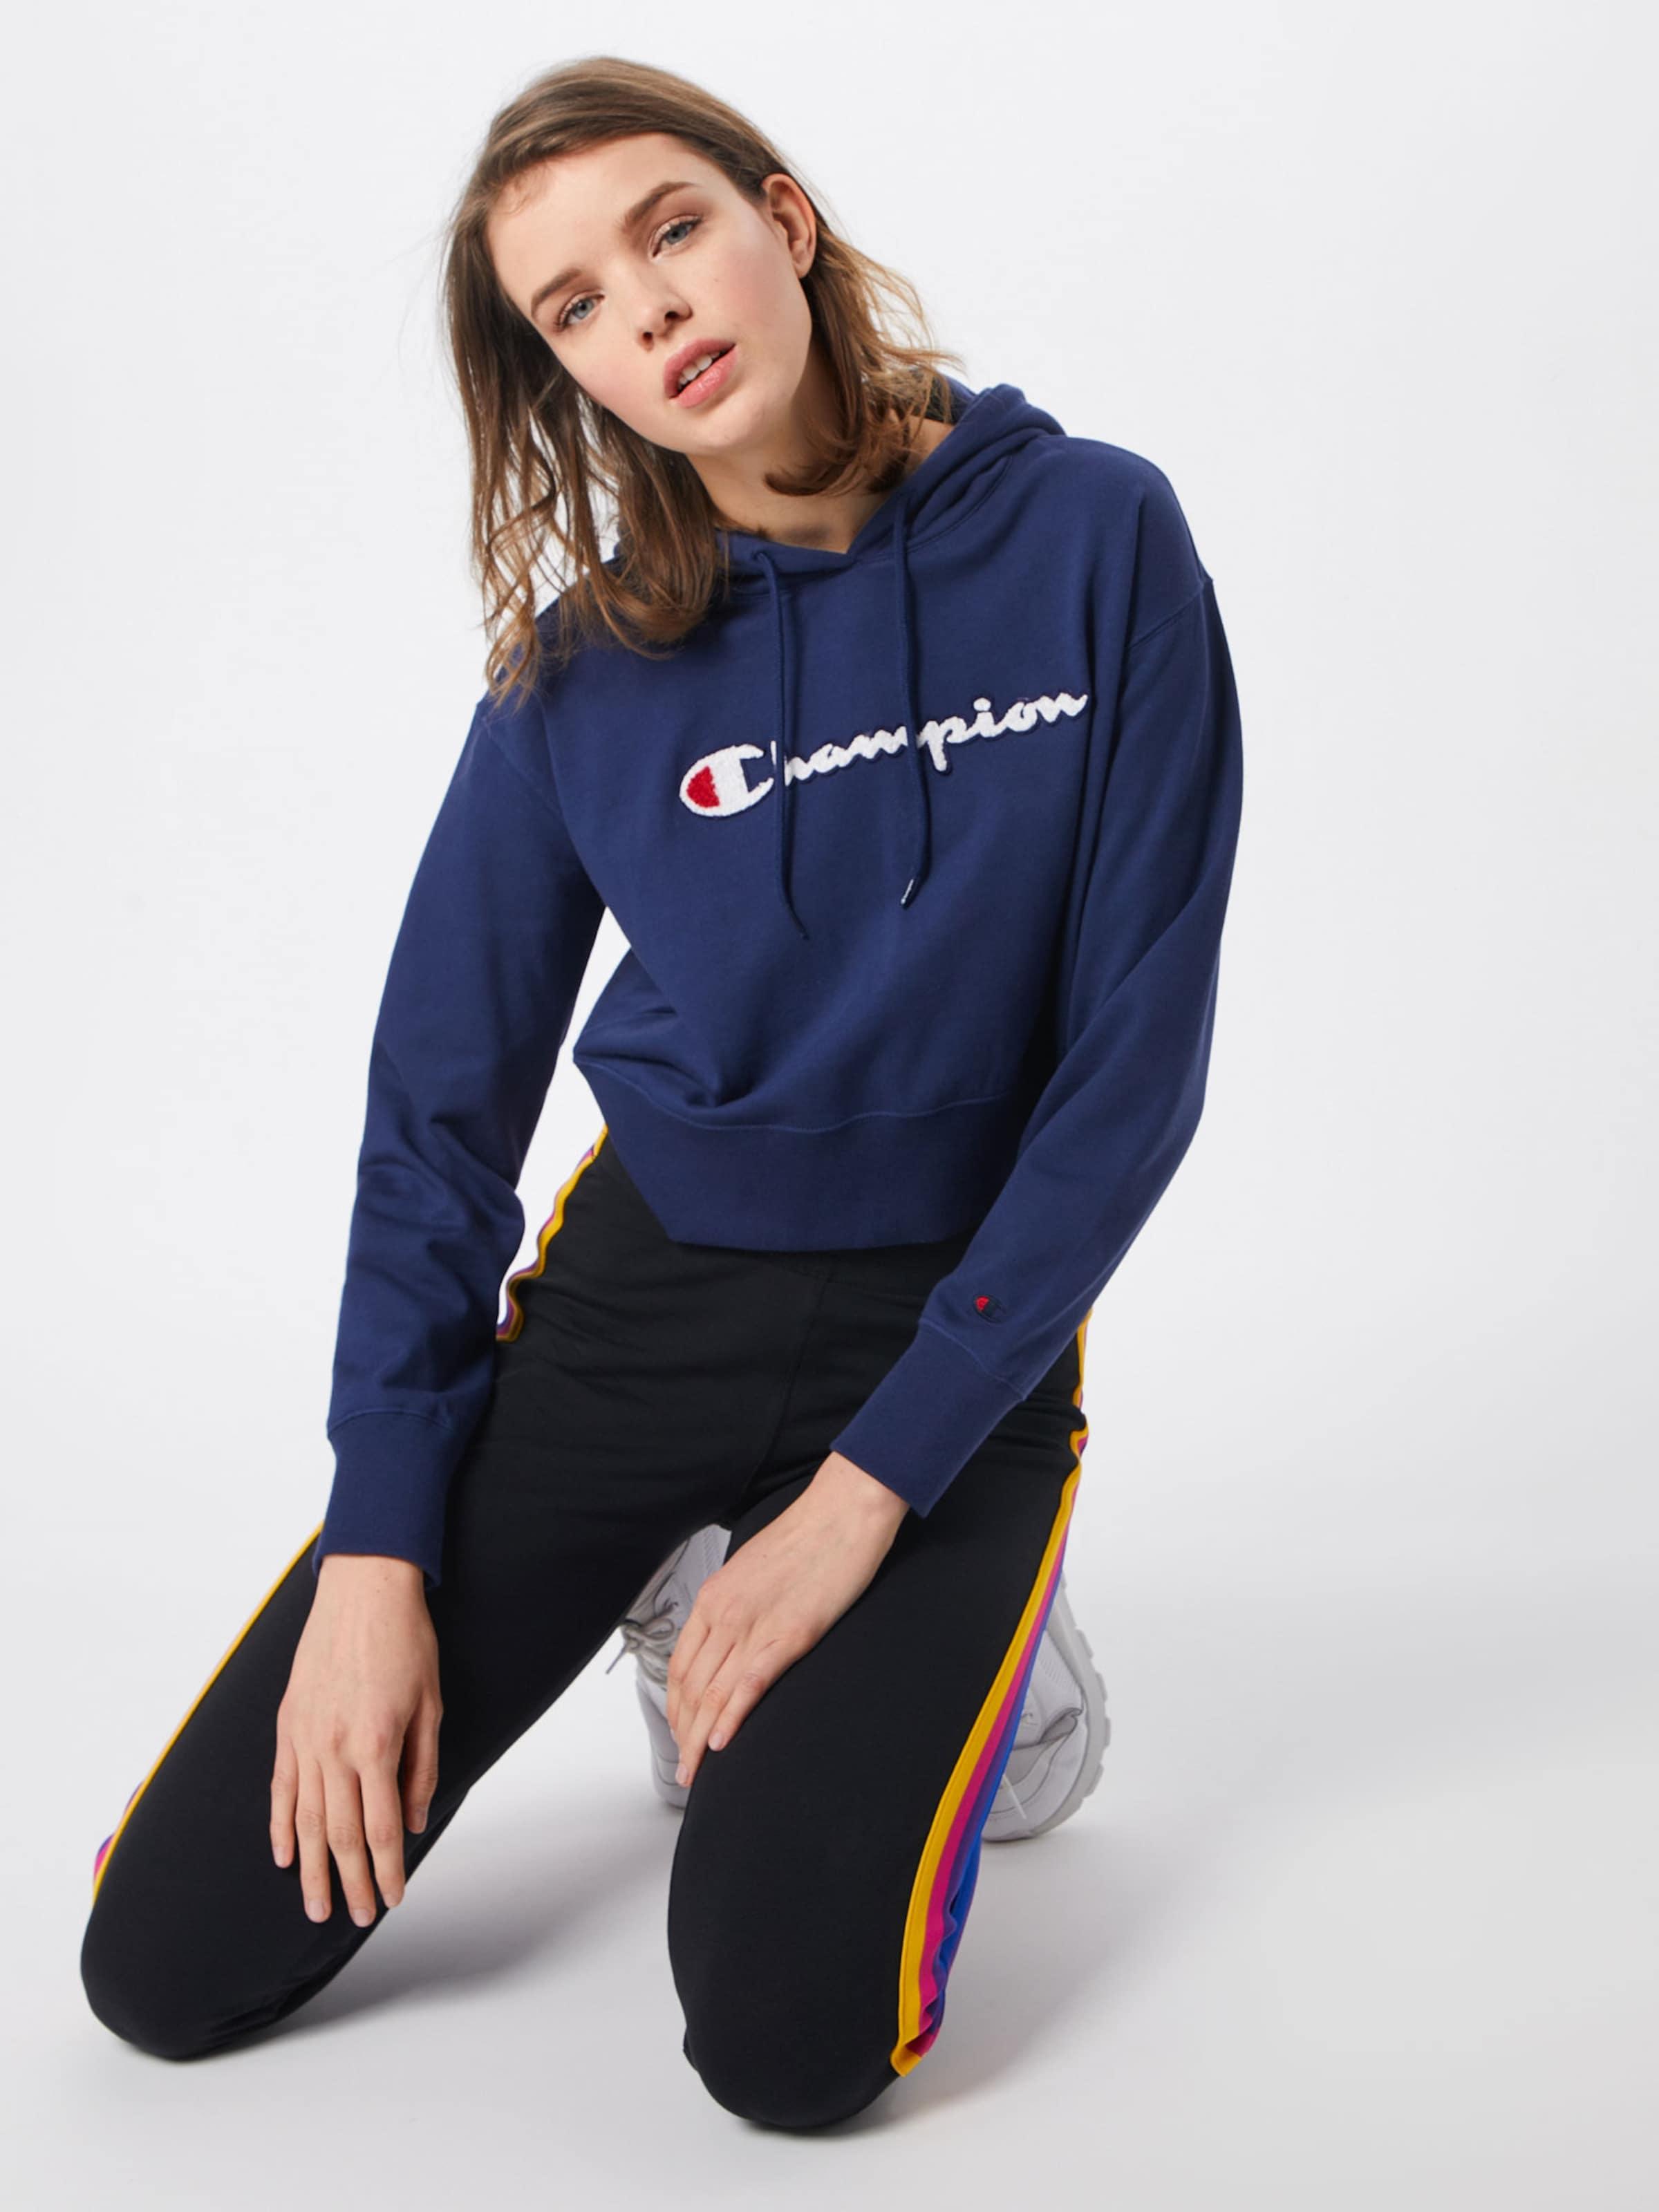 shirt Sweatshirt' Apparel Zip Champion Bleu 'rochester Authentic Marine Sweat En Full Athletic Hooded NnOZX0Pk8w